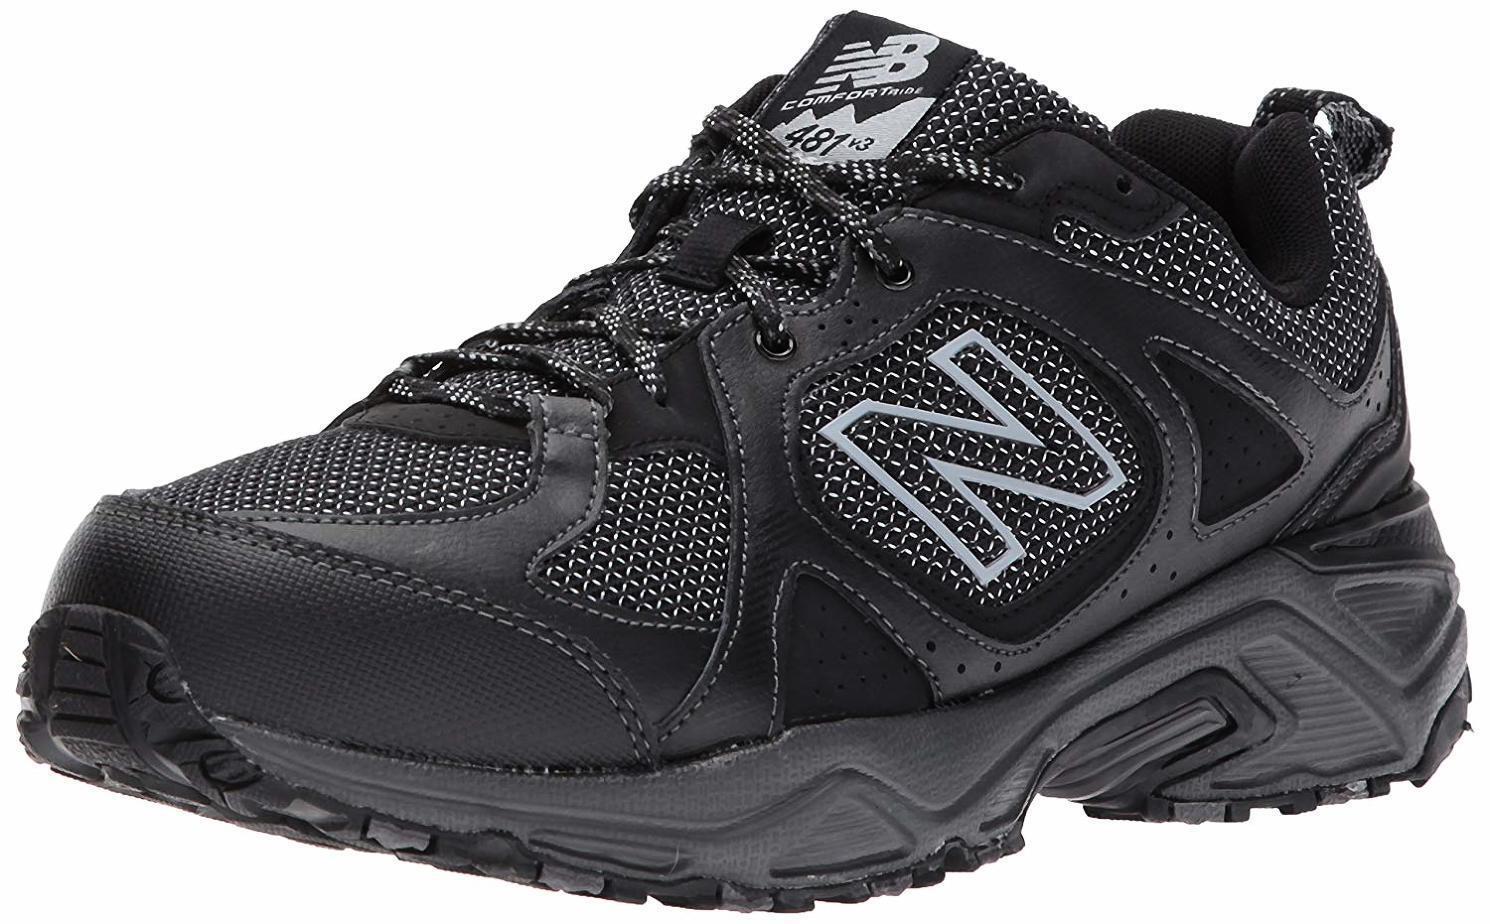 New Balance Men's 481V3 Cushioning Trail Running shoes - Choose SZ color